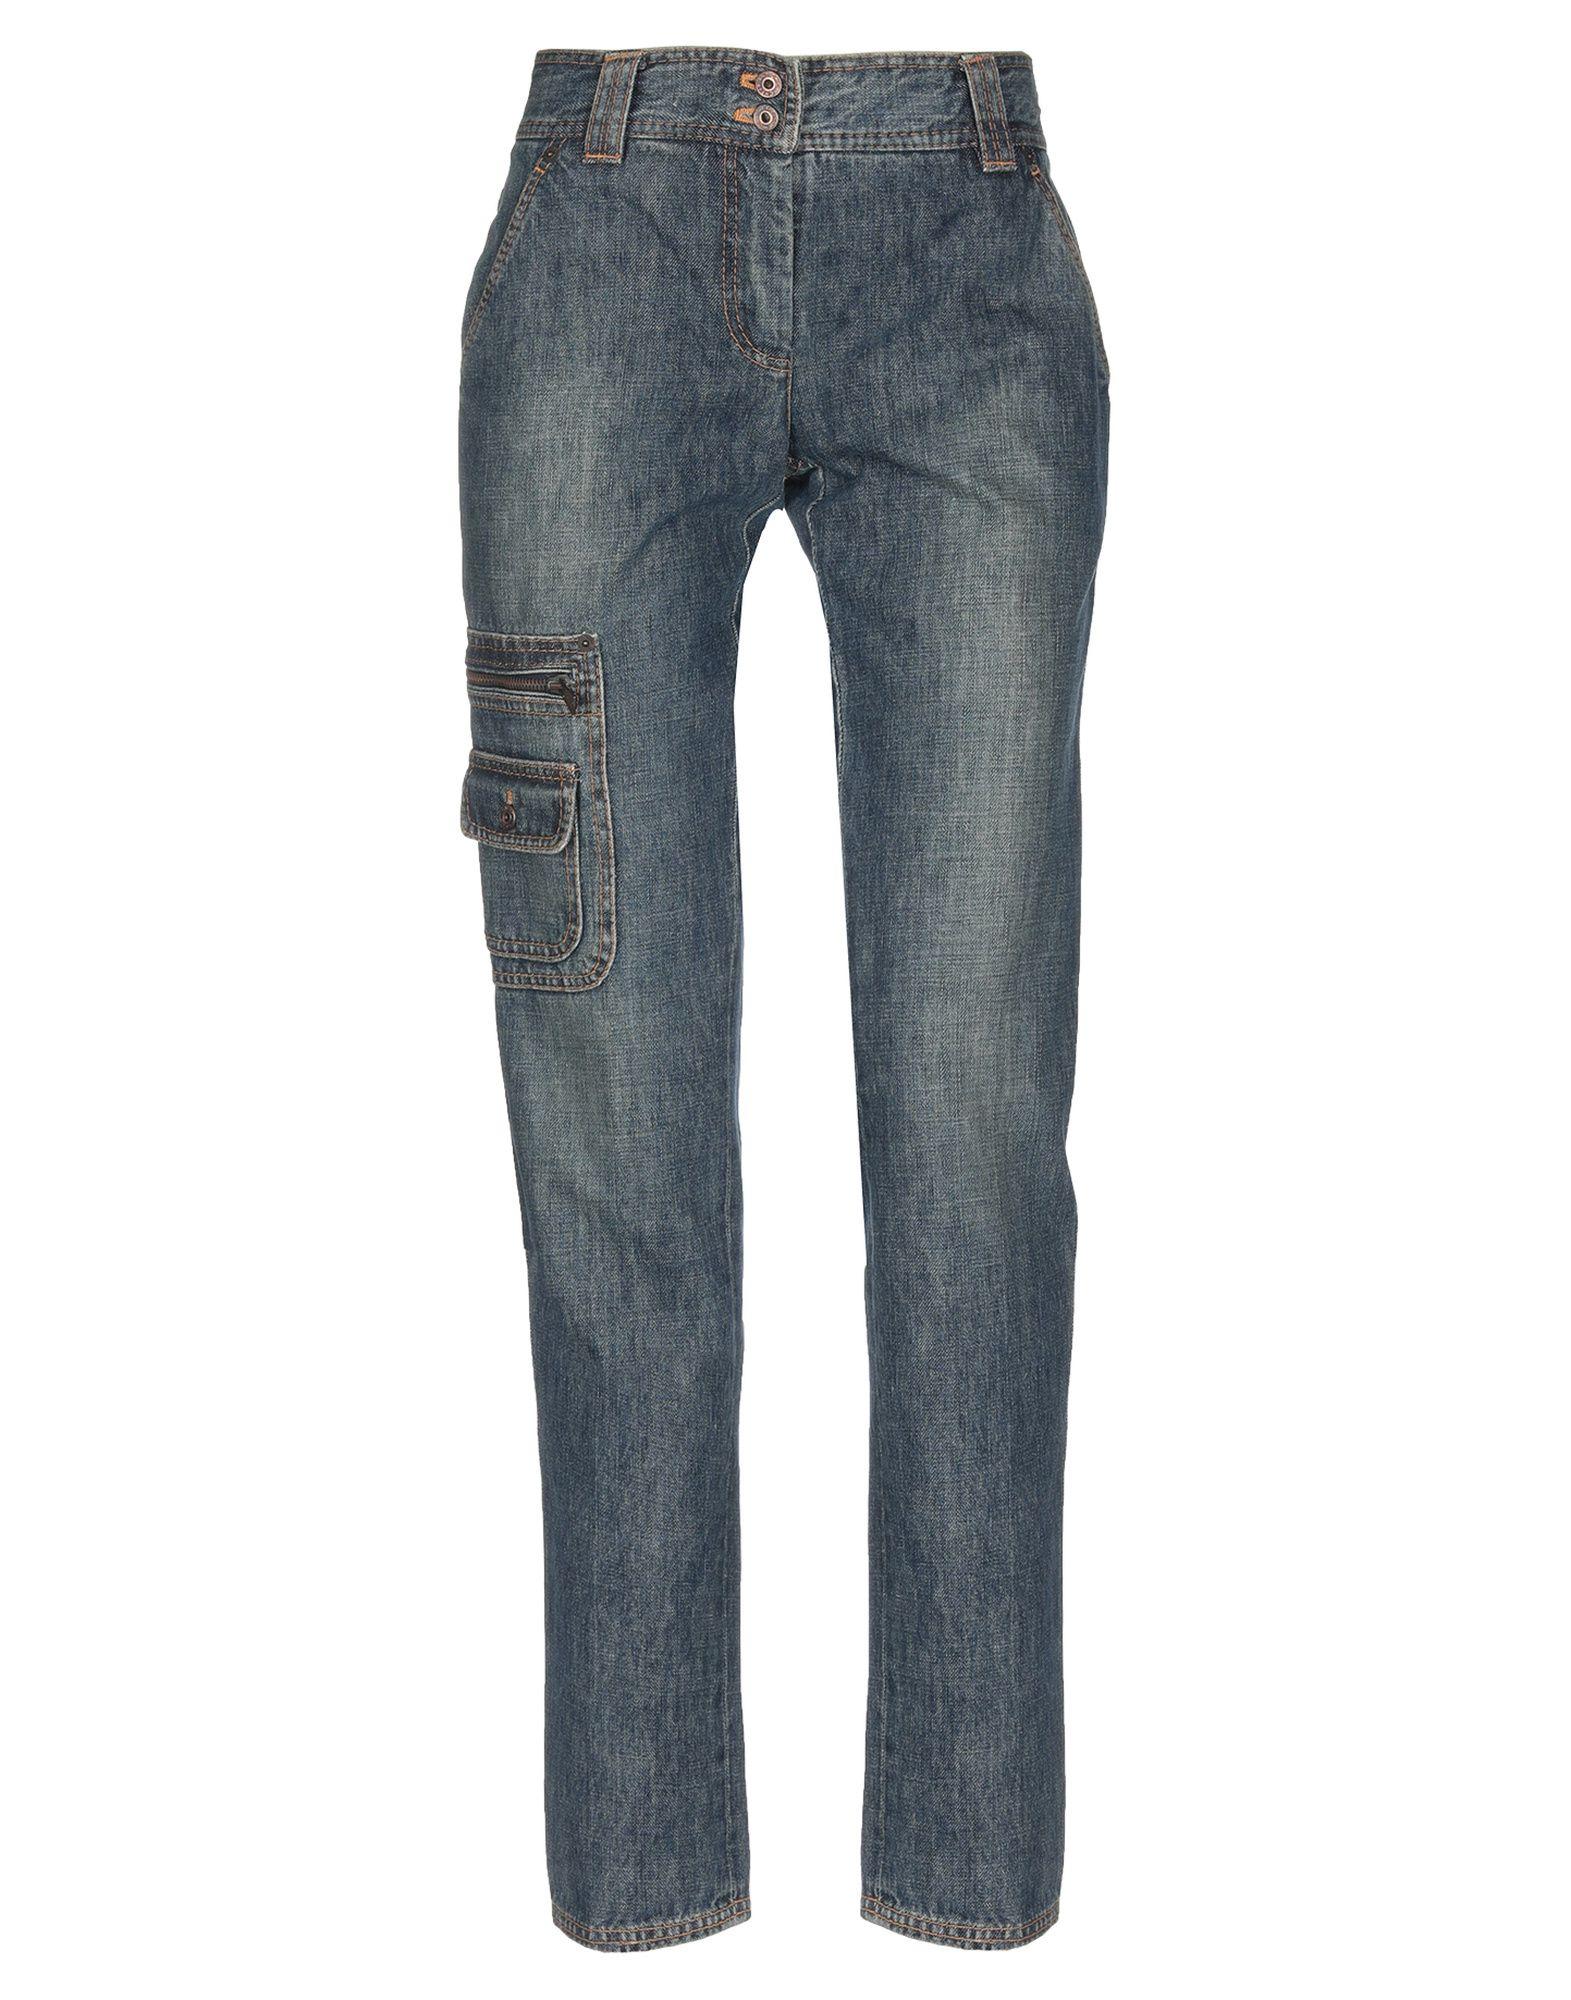 MOSCHINO CHEAP AND CHIC Джинсовые брюки